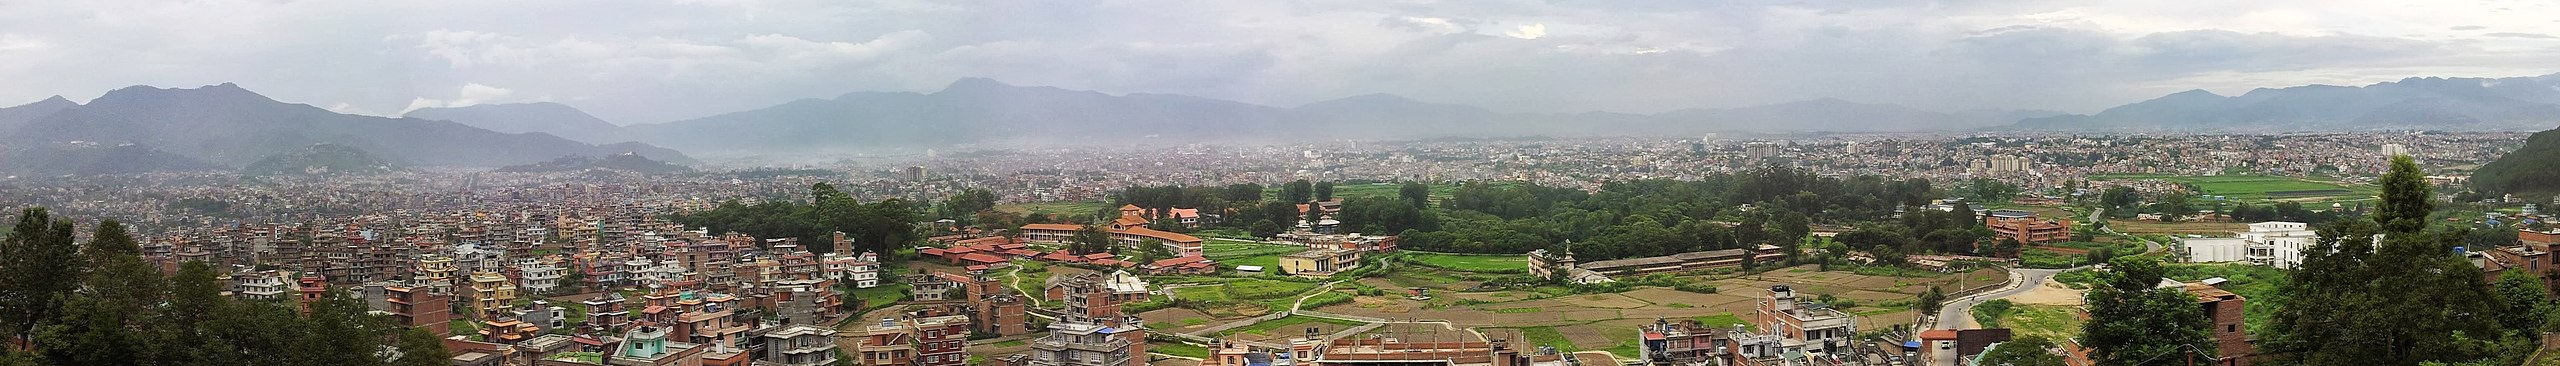 Kathmandu Valley – Travel guide at Wikivoyage